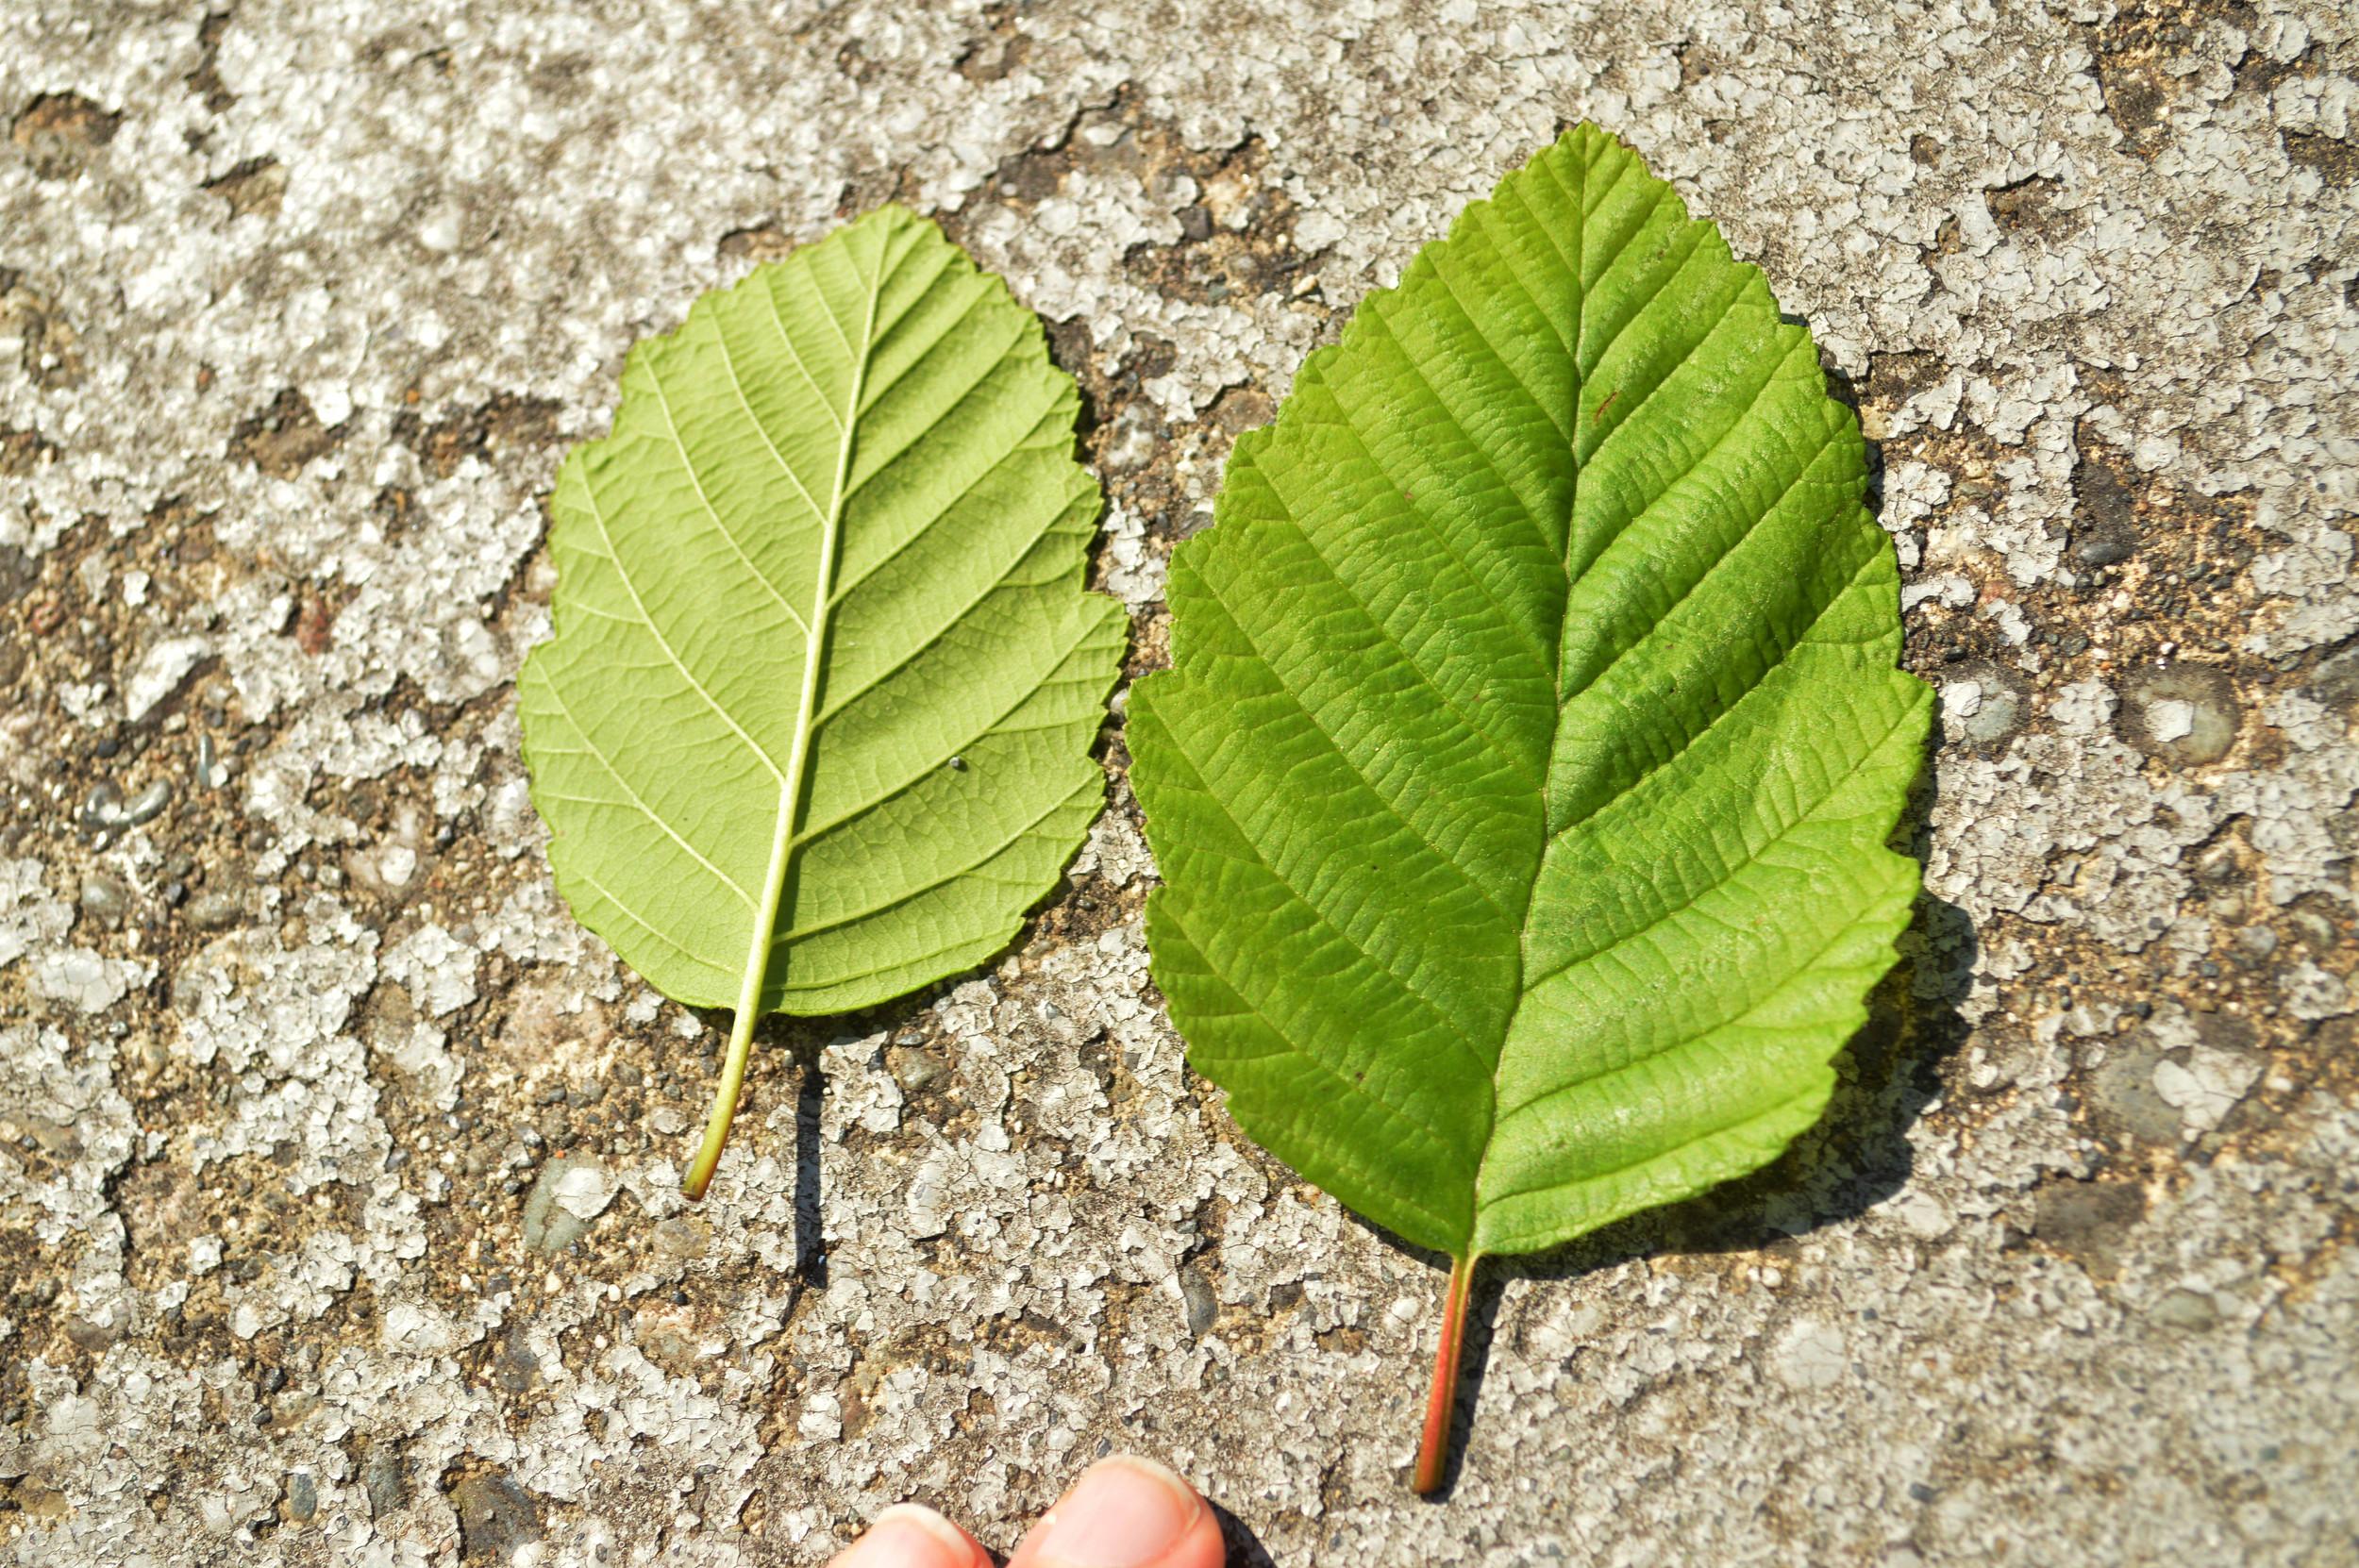 Tree Id Red Alder Trees Vs Black Cottonwood The